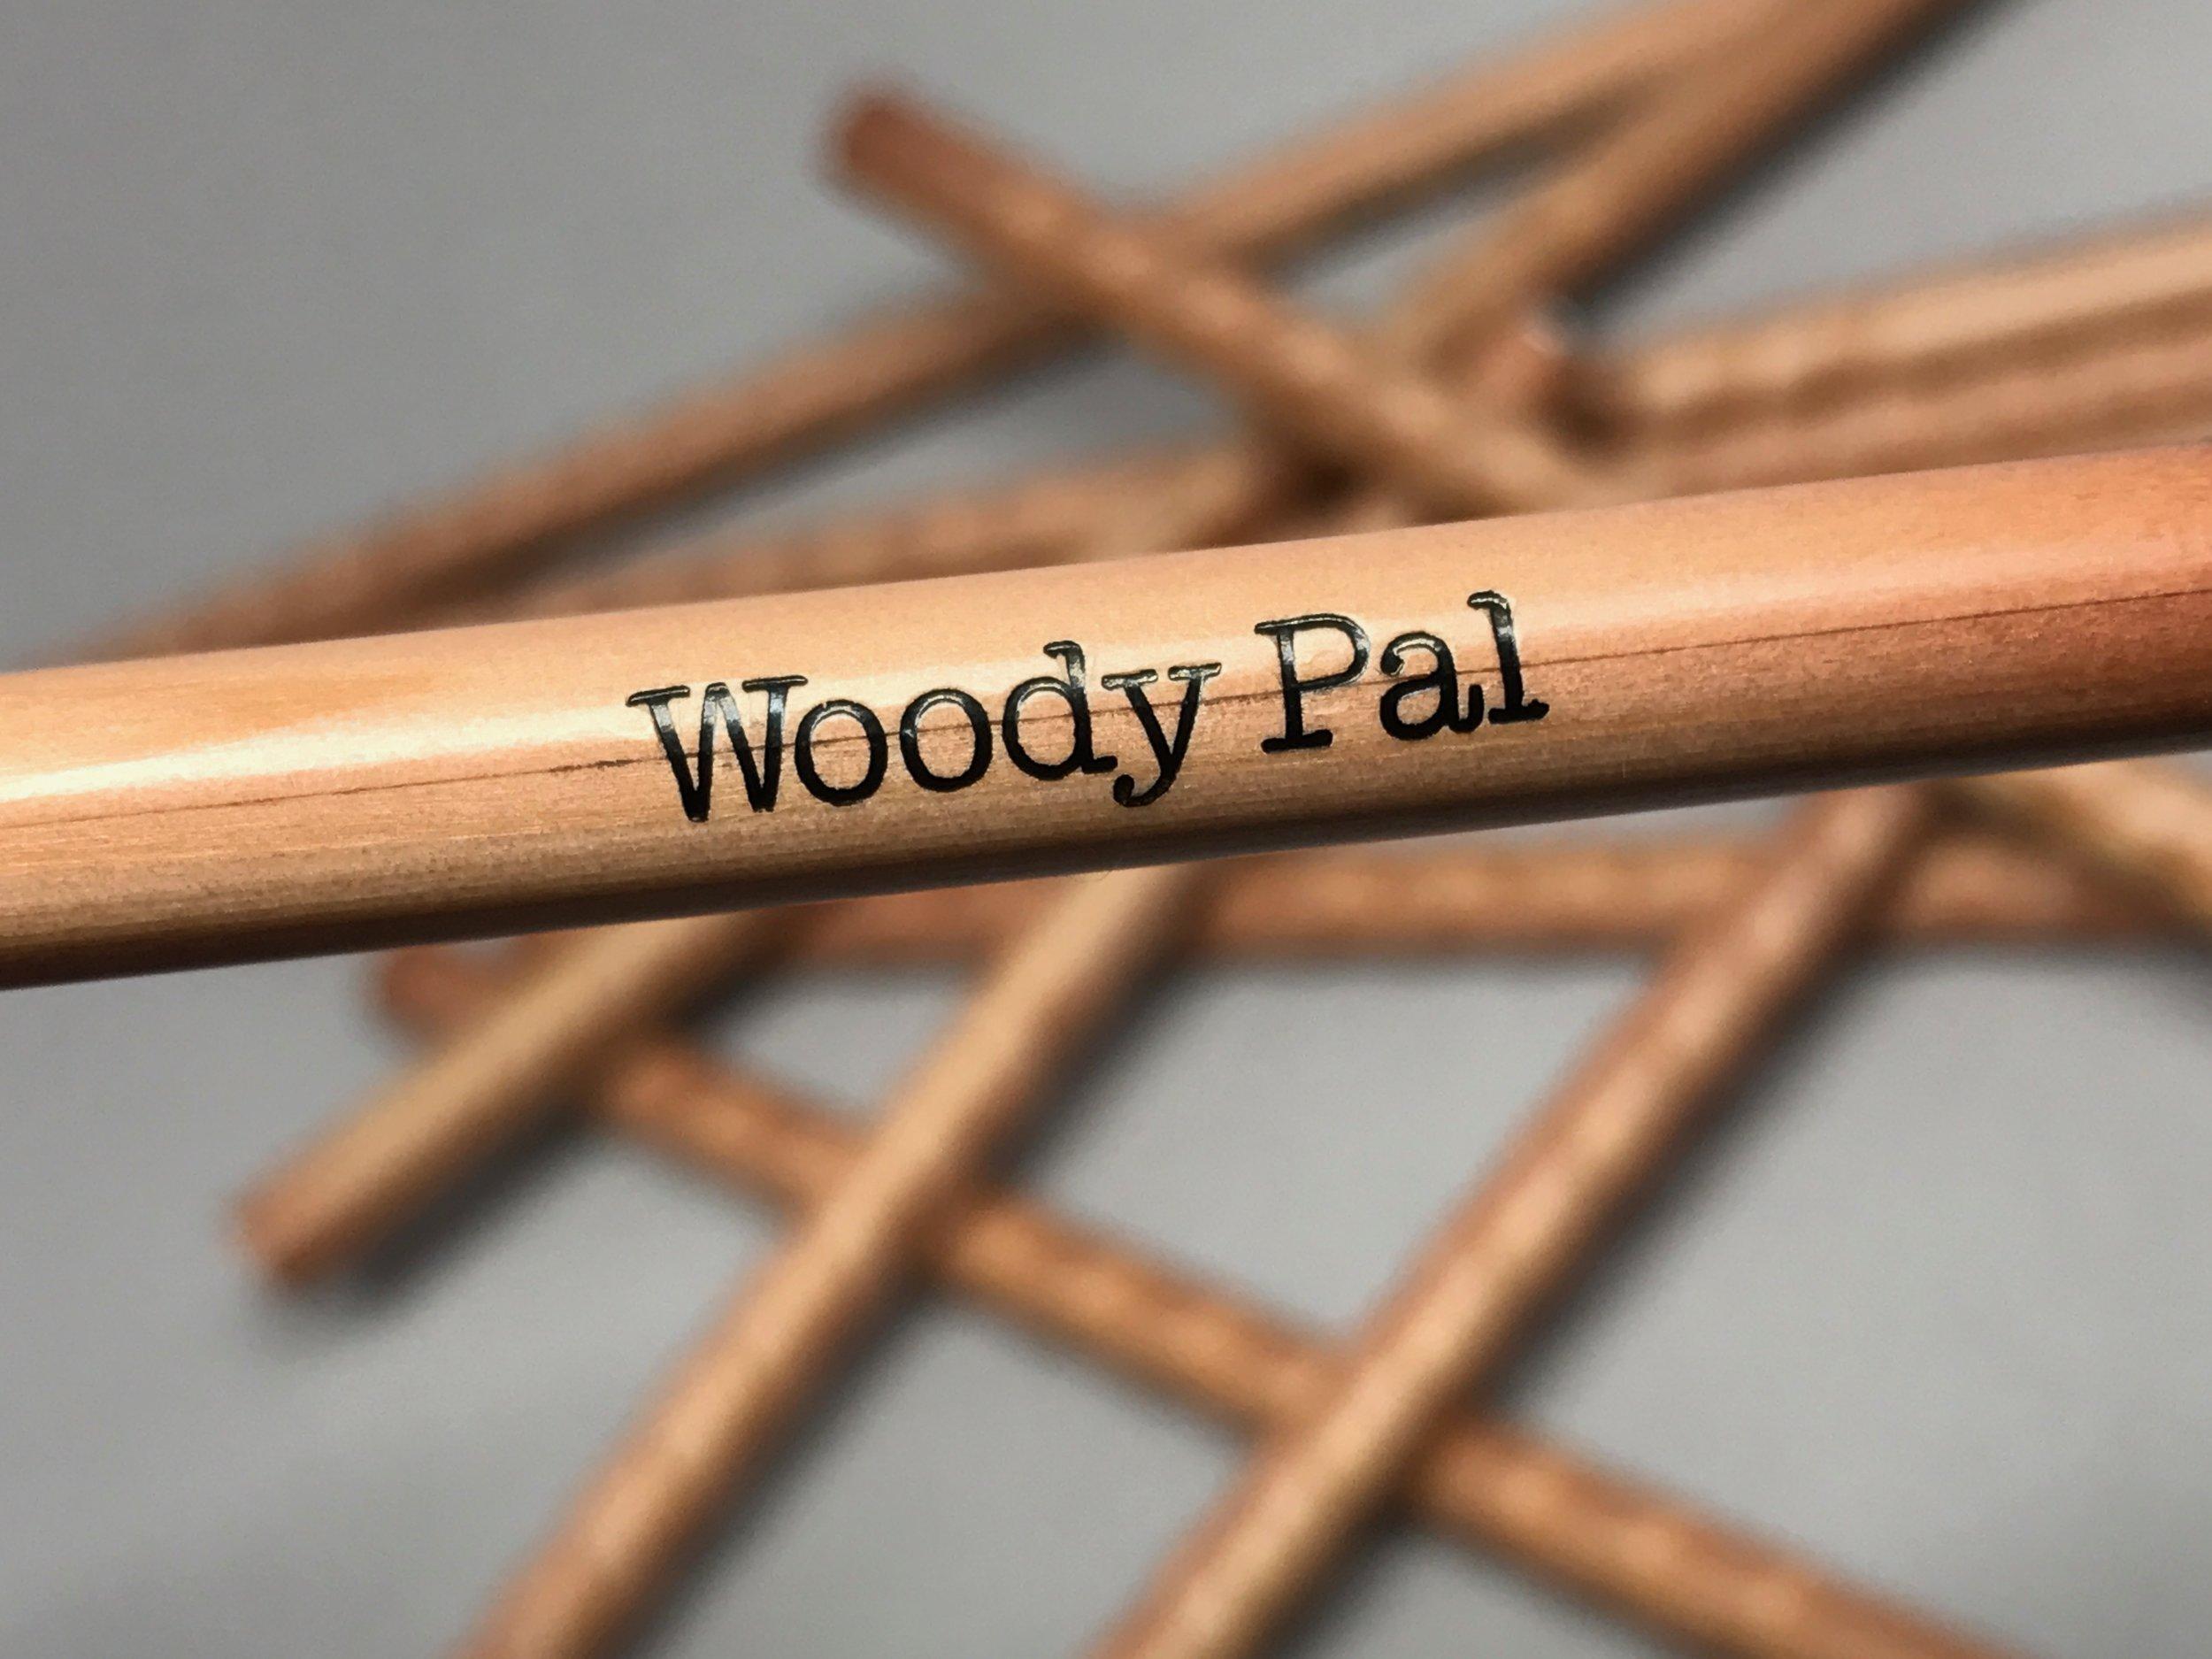 kirin-woody-pal-eddy-pencil-14.jpg